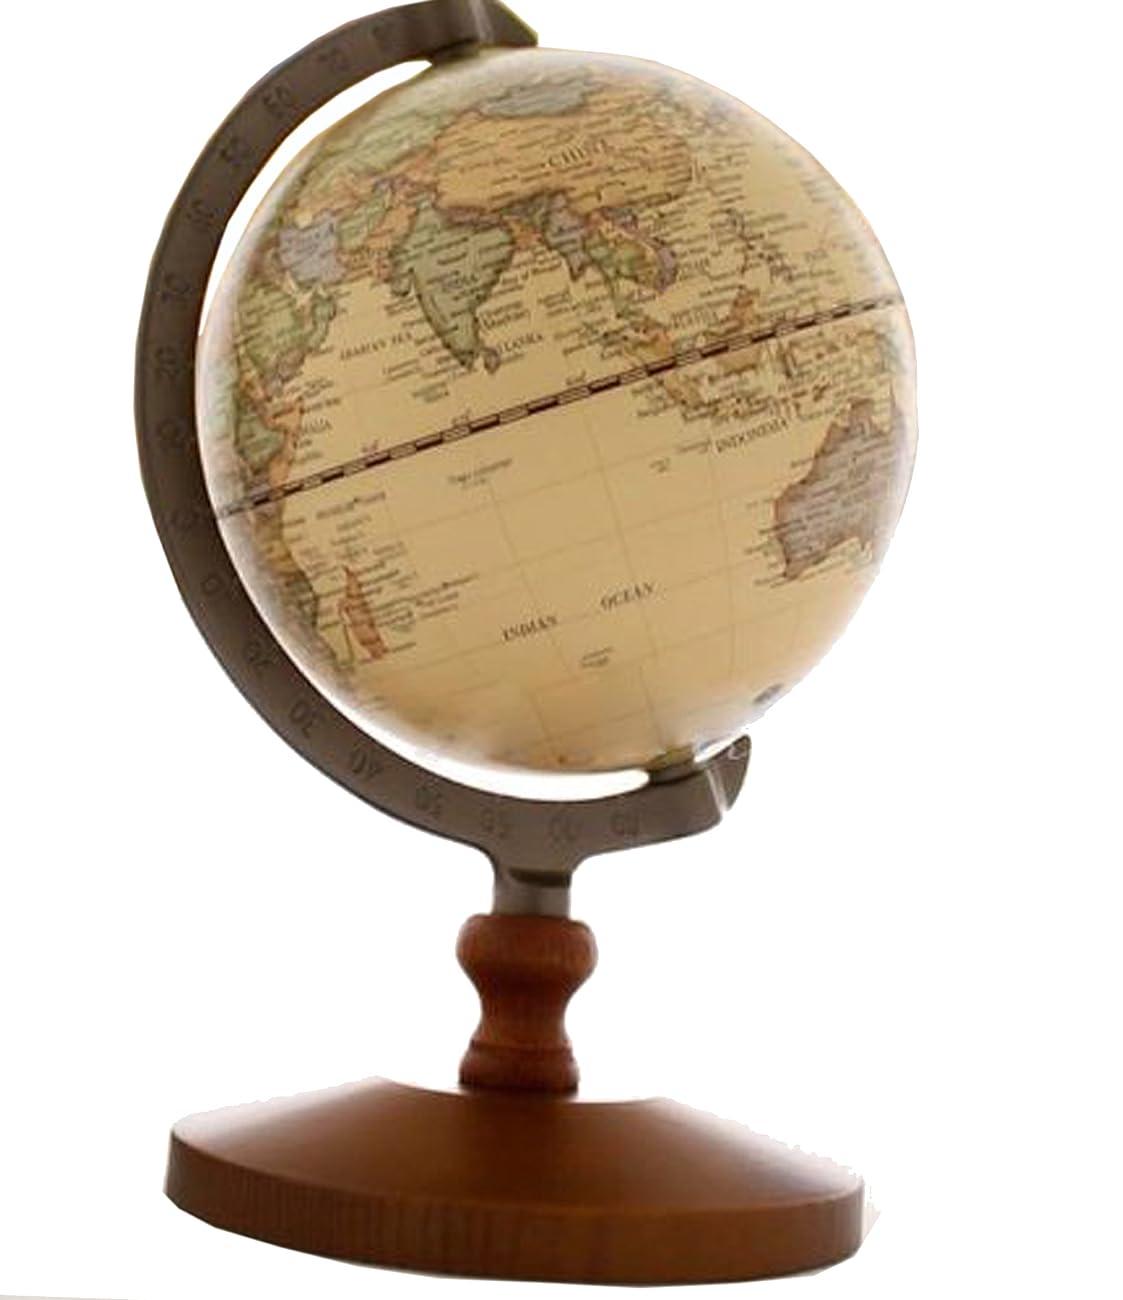 VStoy Vintage Reference World Globe Home Work Decor Wedding Educational Gift 14cm 0